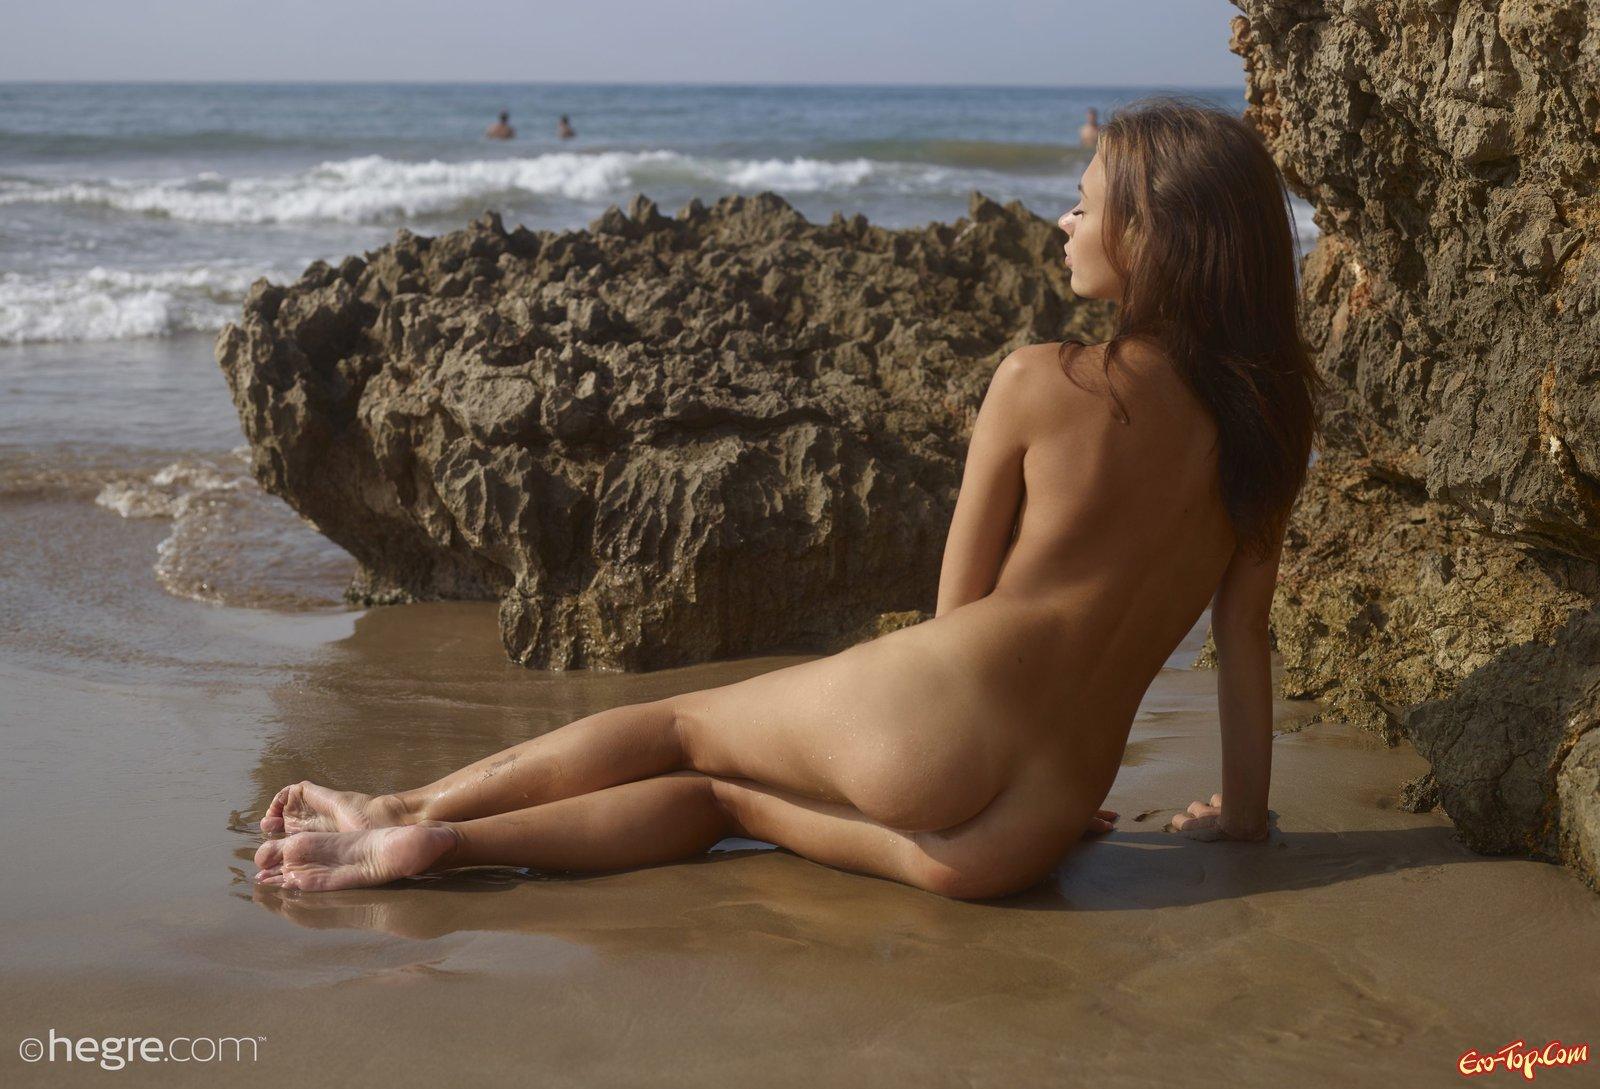 Хорошенькая шатенка с маленьким бюстом намочилась на море